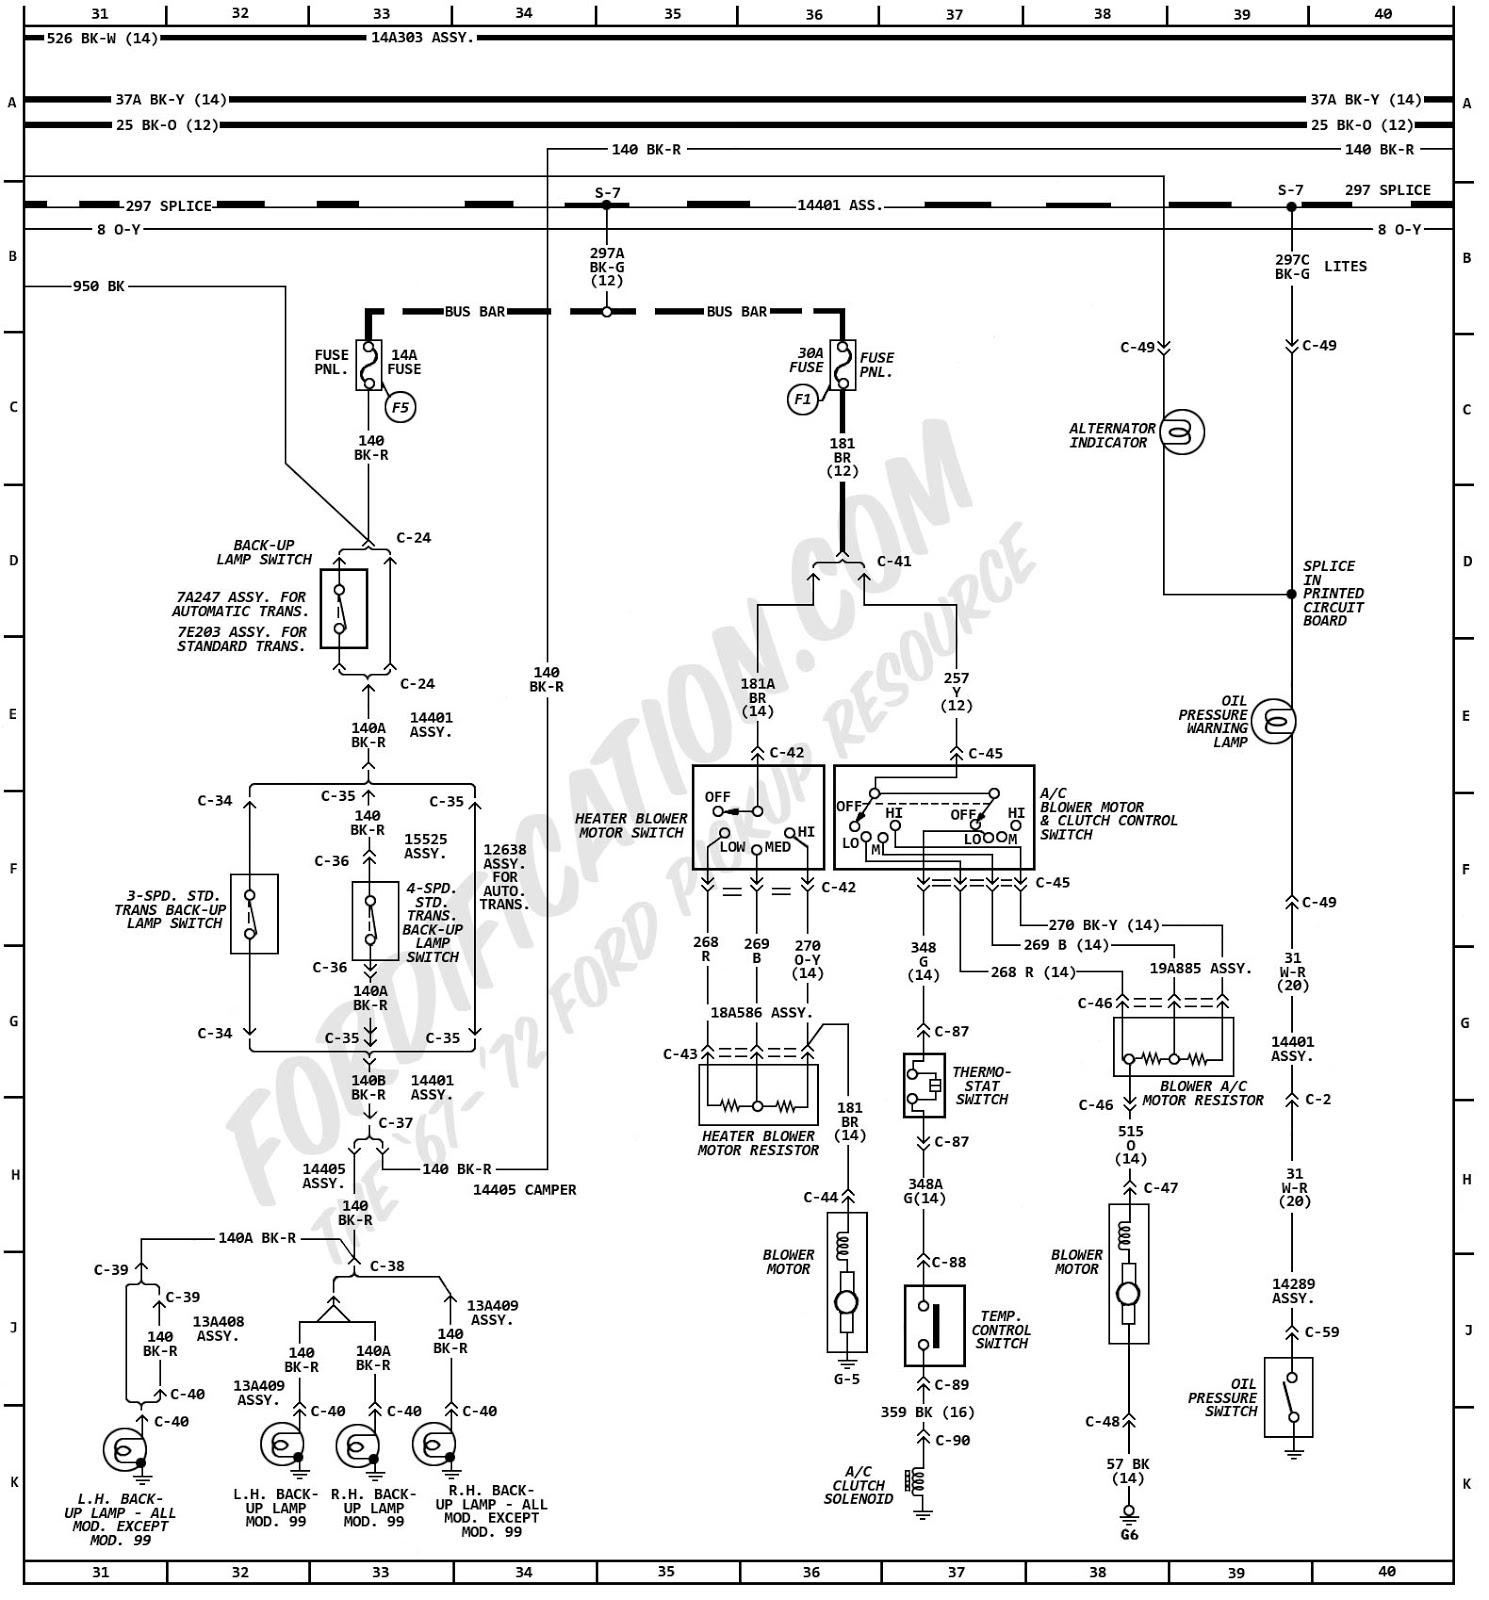 Ac Motor Speed Picture: Ac Motor Wiring Diagram